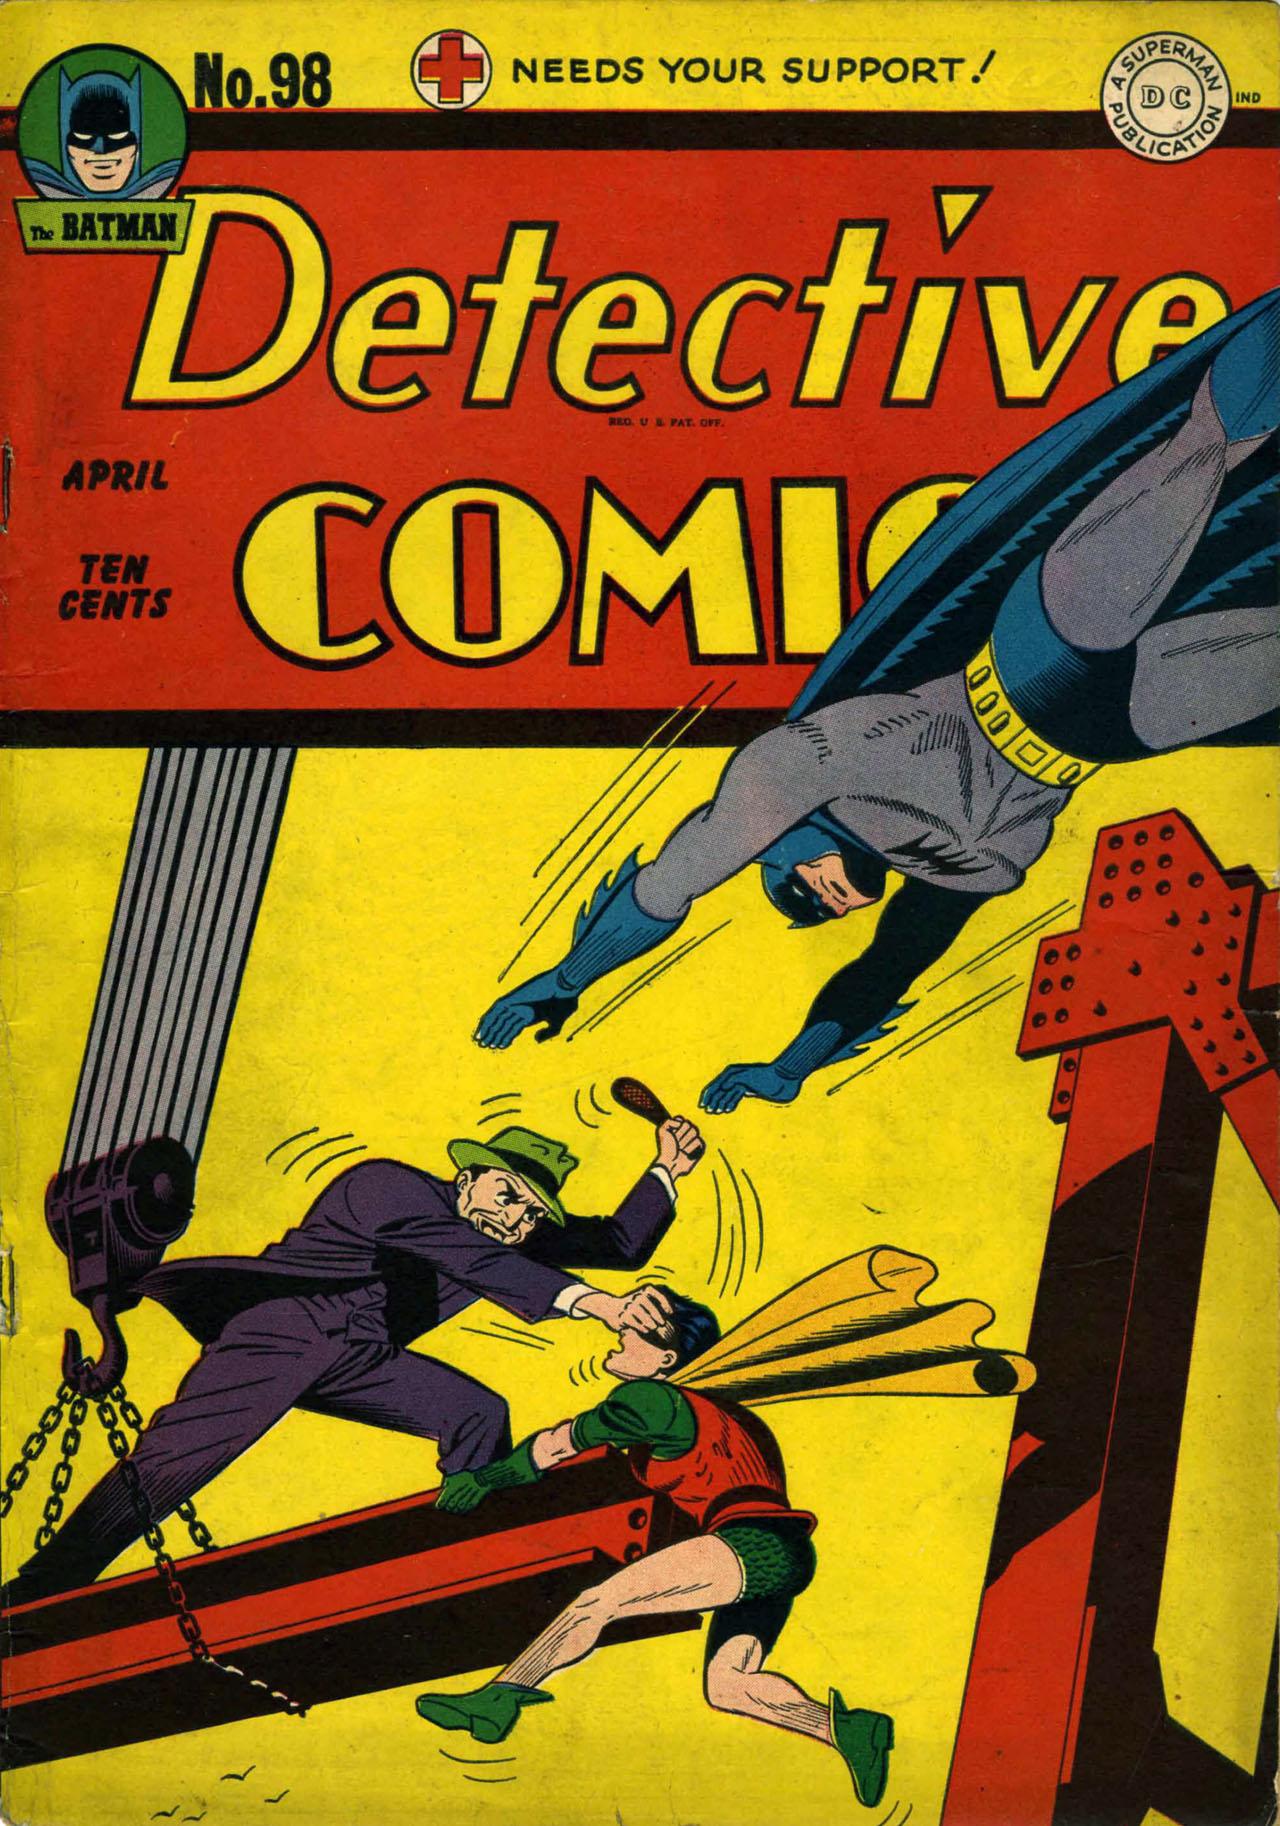 Detective Comics (1937) 98 Page 1